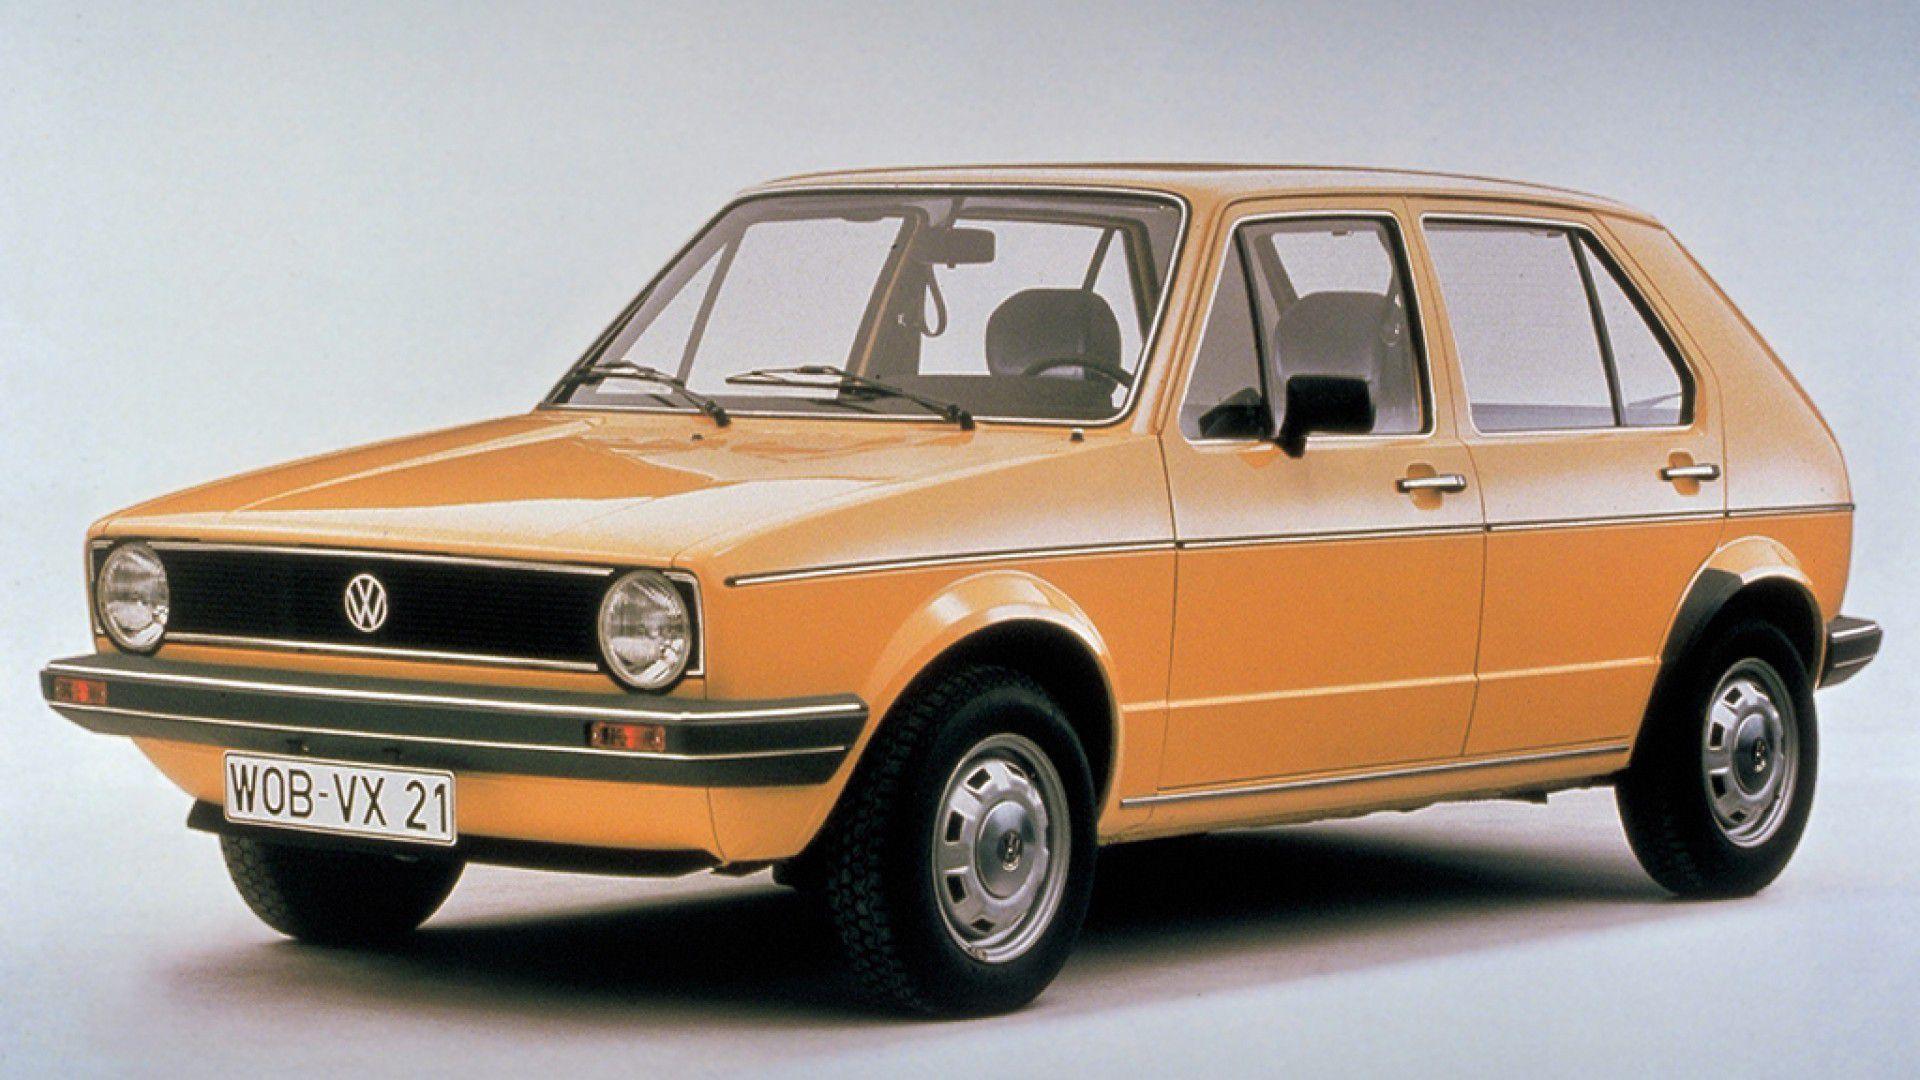 Volkswagen Polo Mk1 187 Definitive List Cars